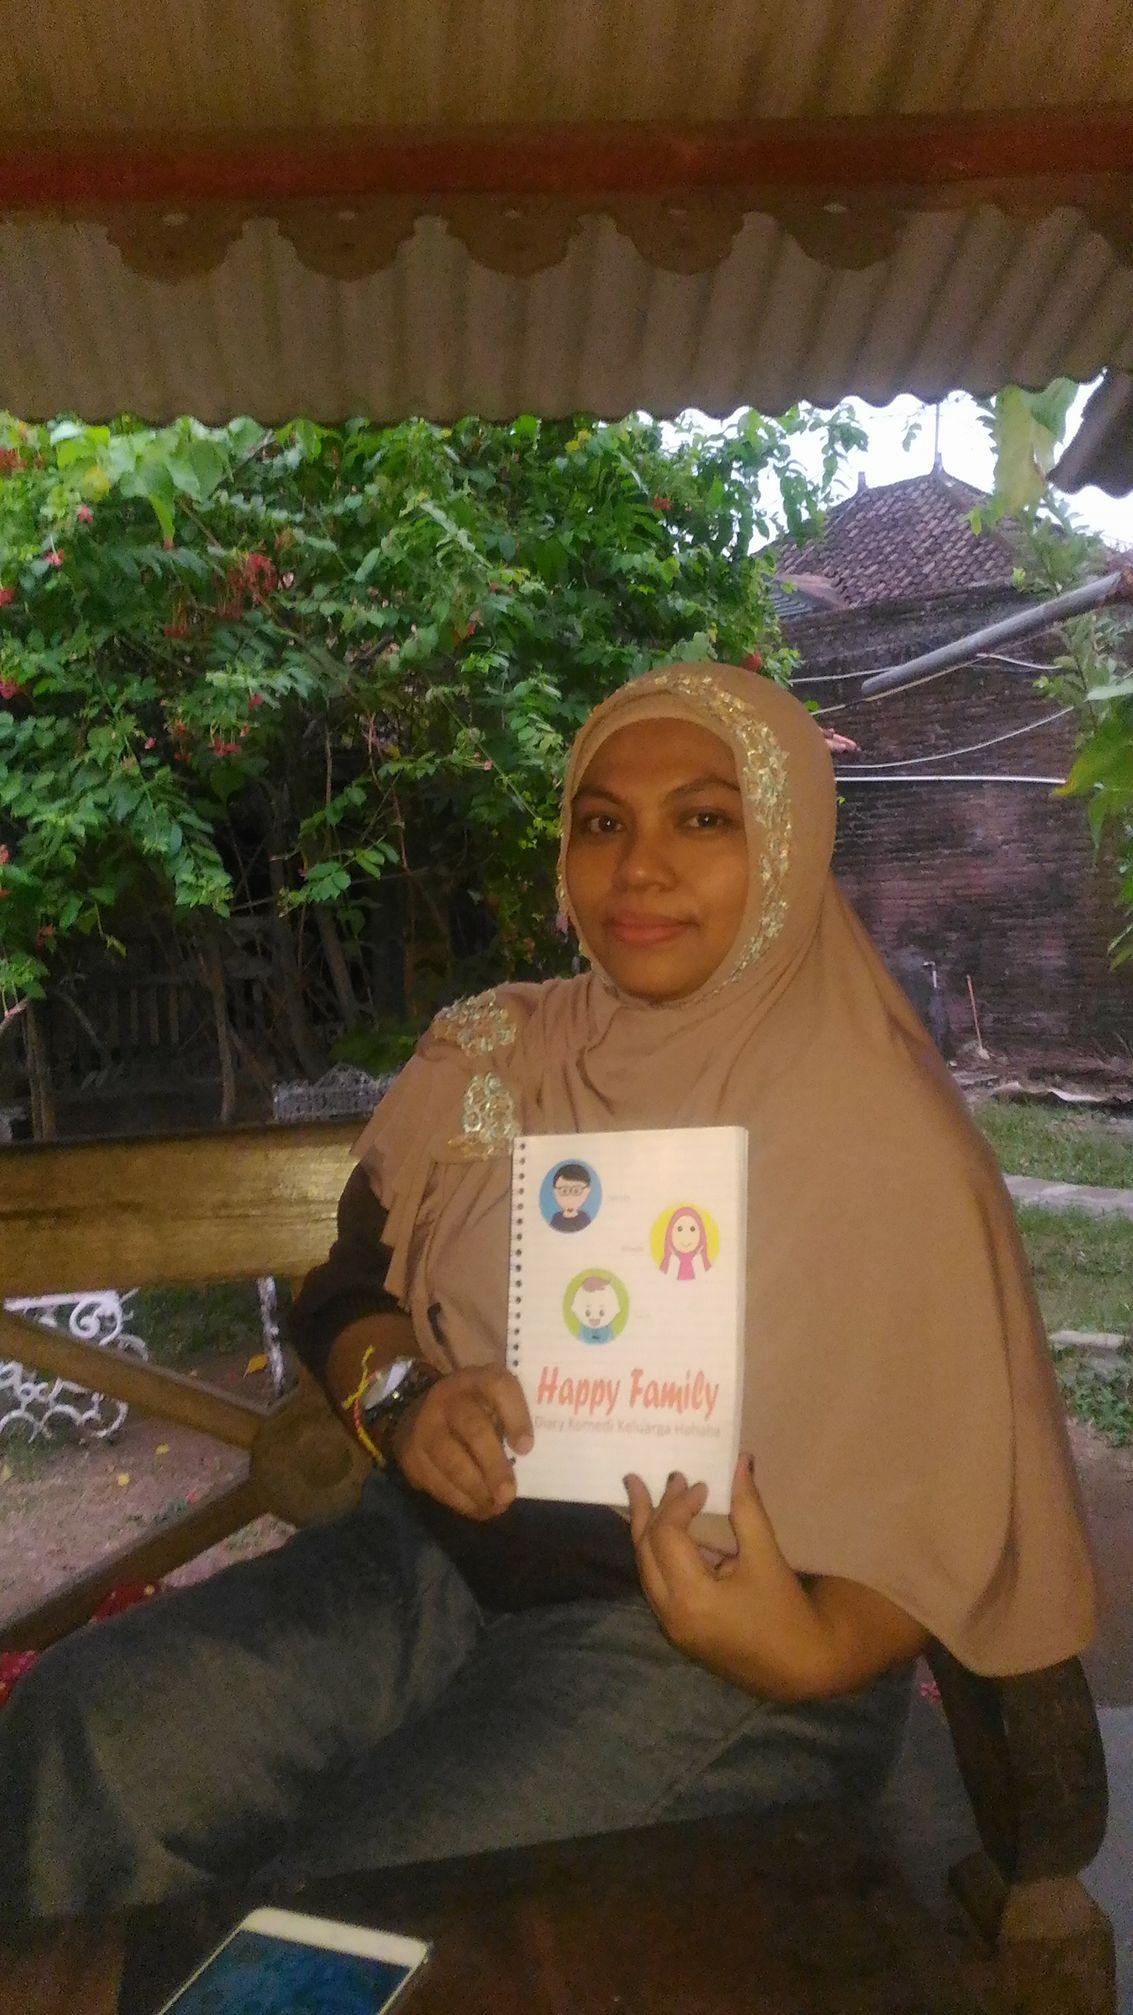 Galeri : Pembaca Happy Family, Diary Komedi Keluarga Hahaha